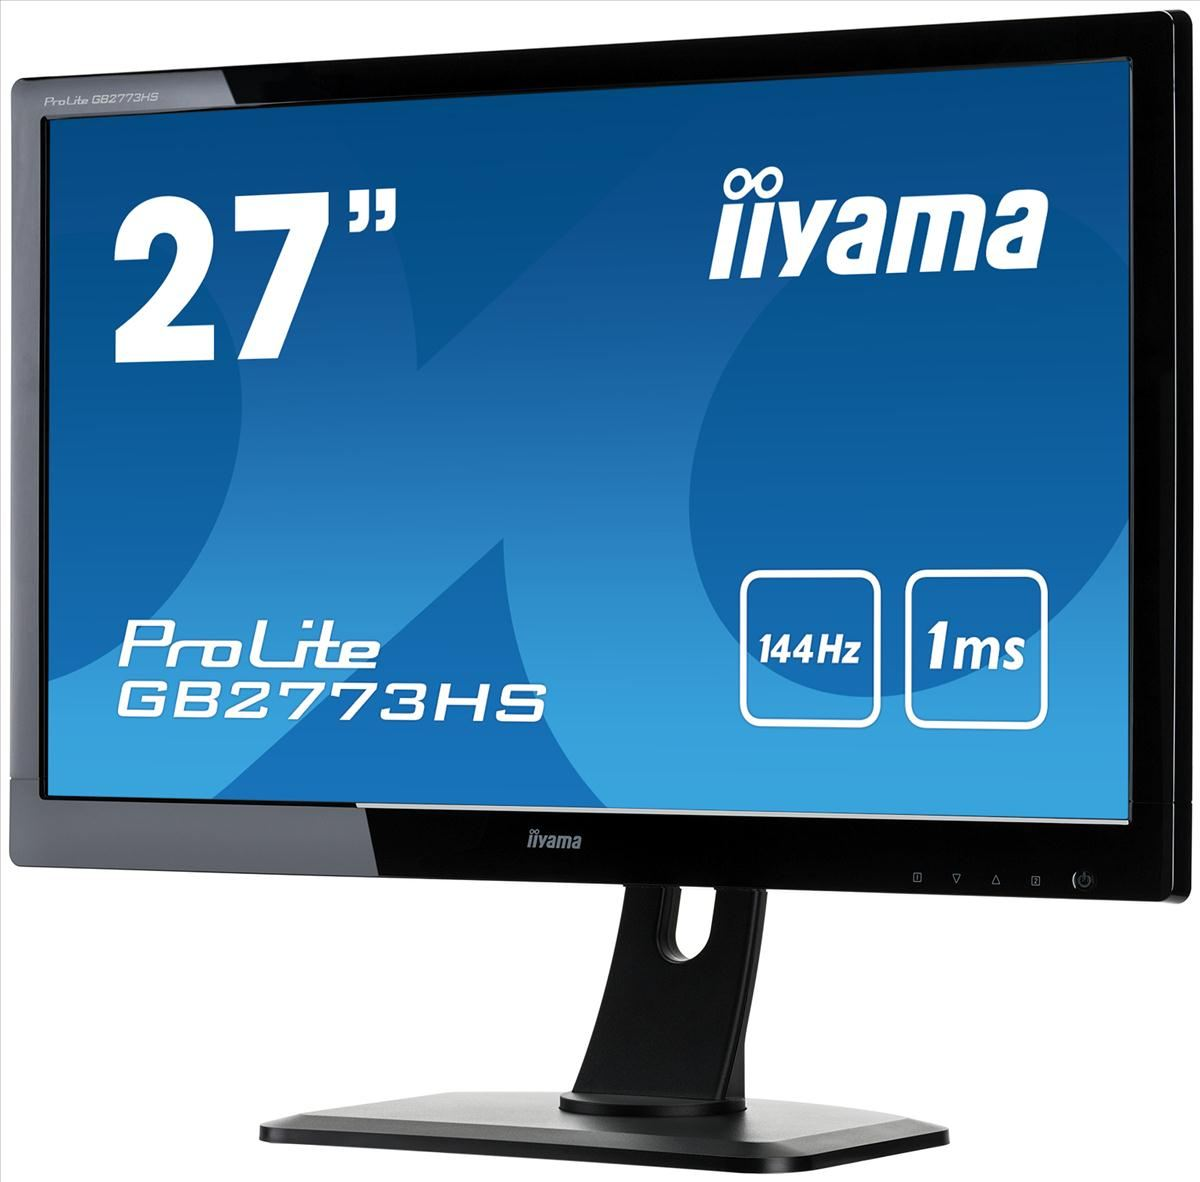 ProLite GB2773HS 2 27 inch LED Backlit LCD Monitor 1000:1 300cd/m2 #074D87